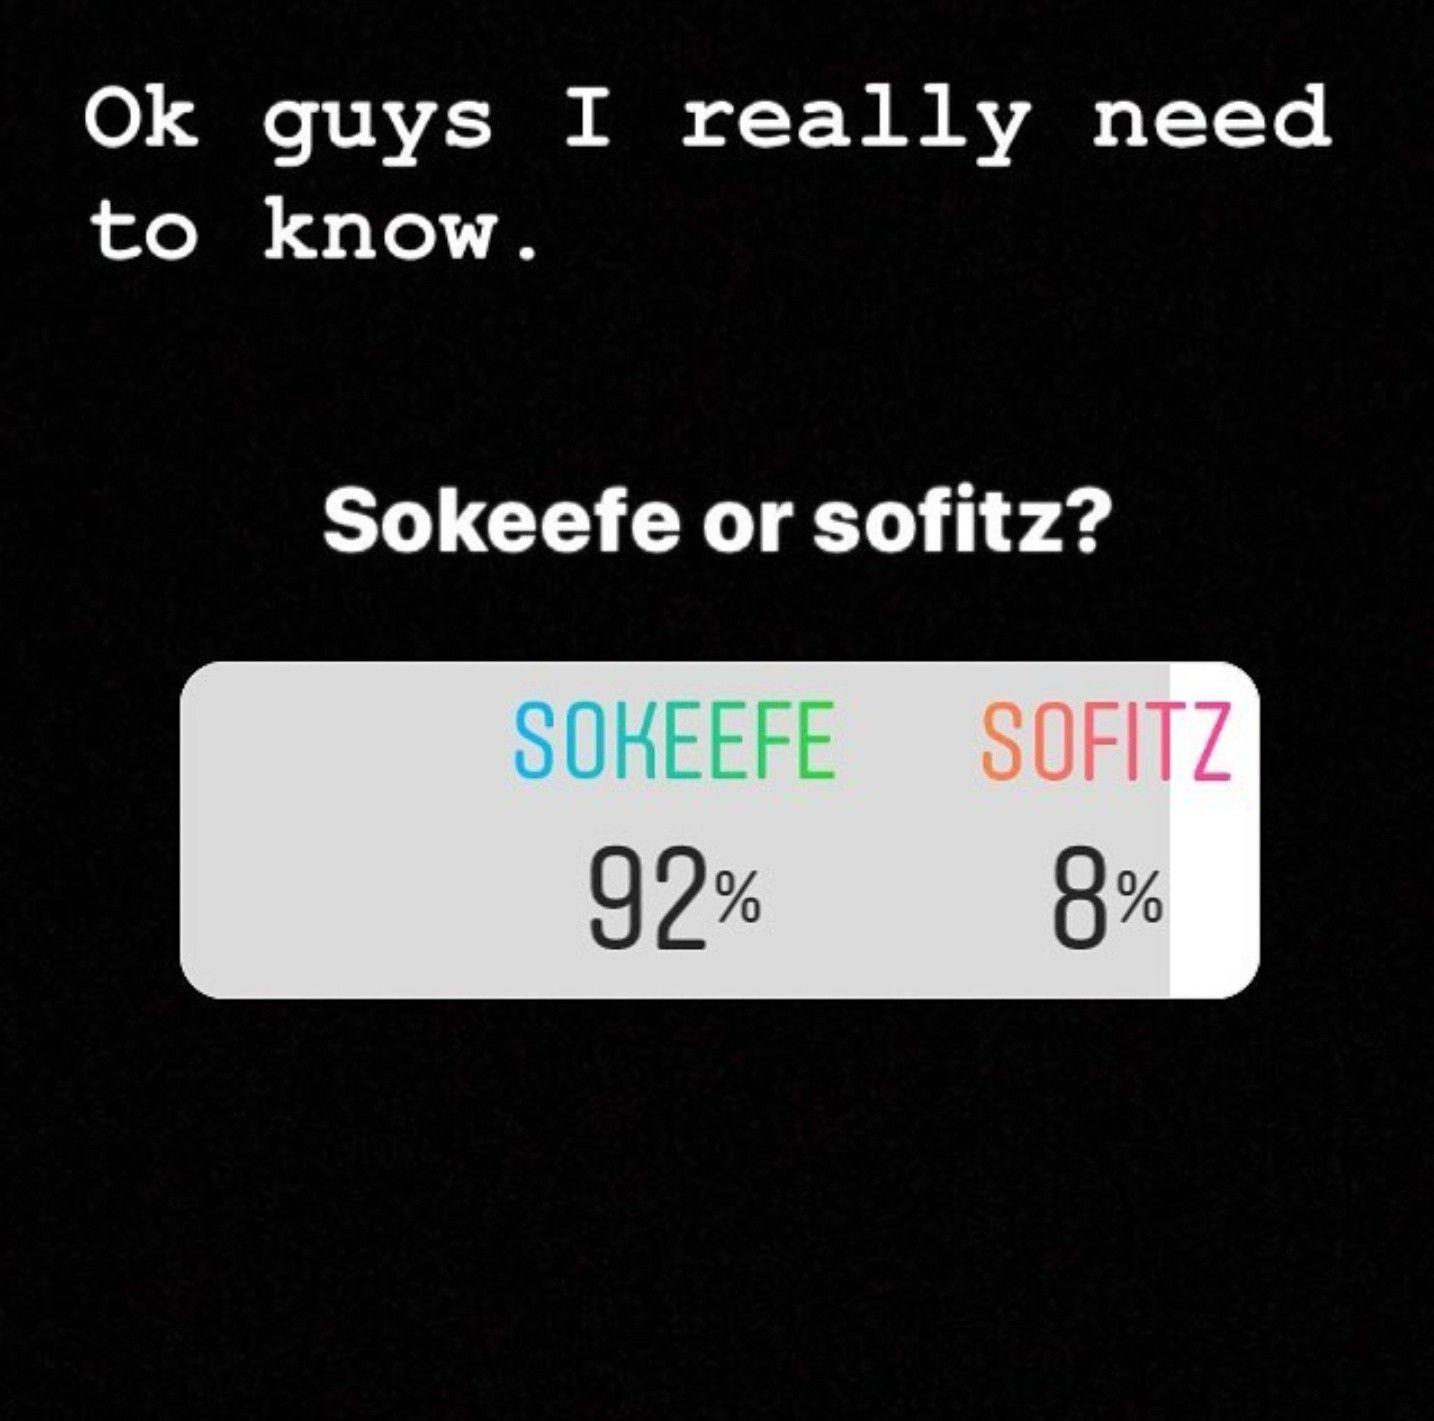 A Popular Instagram Poll For Sokeefe Or Sofitz Kotlc